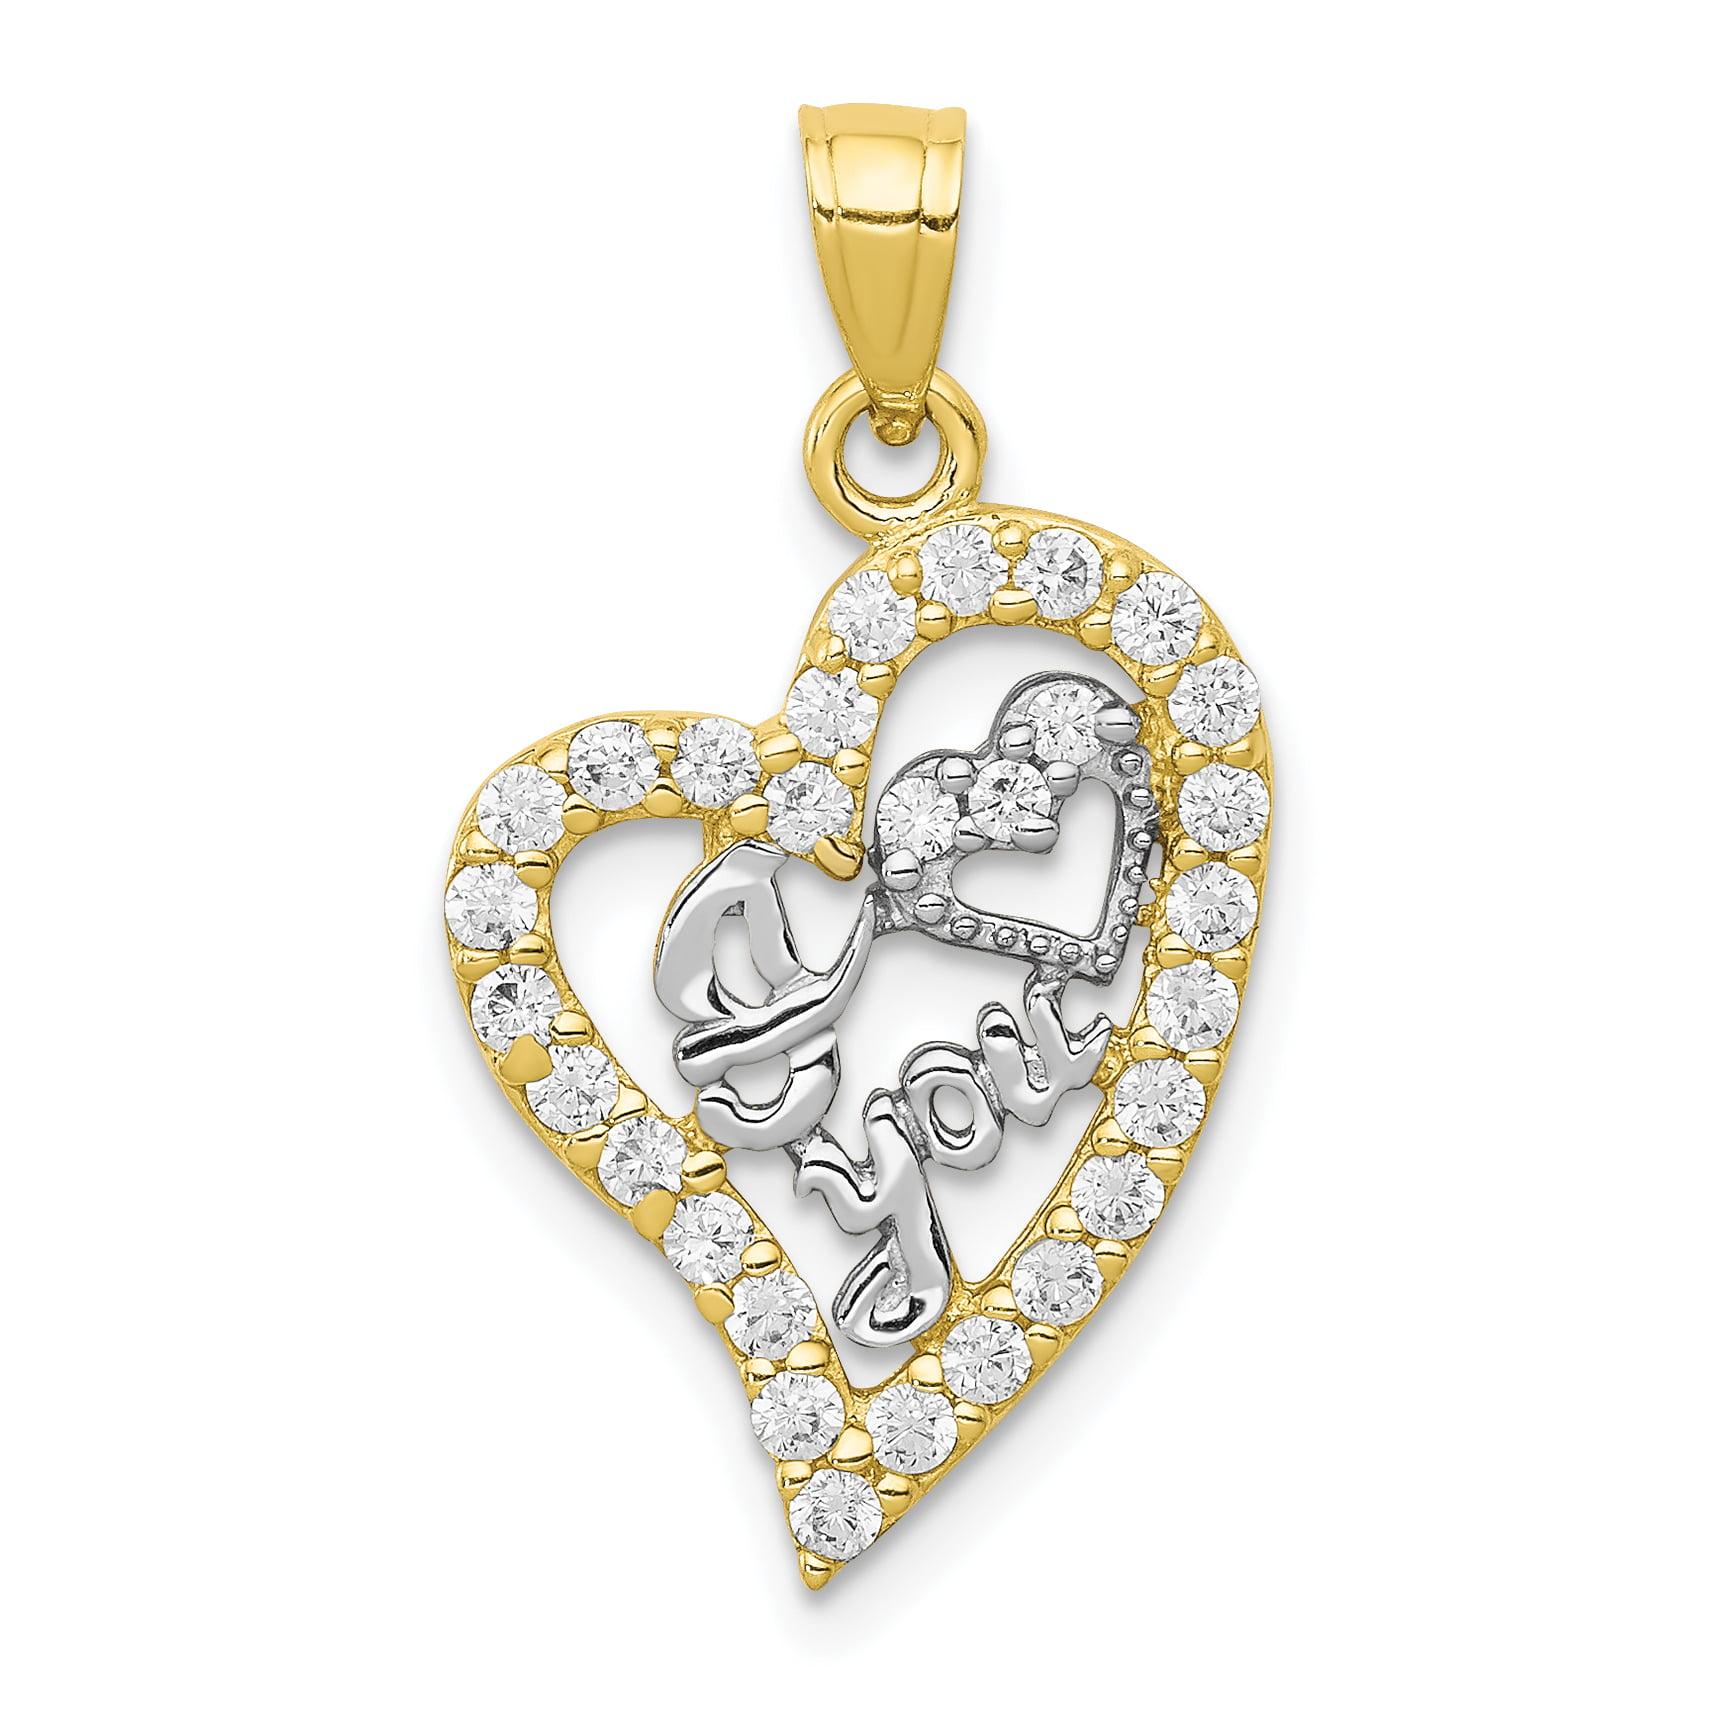 10k Yellow Gold Synthetic CZ Double Heart Pendant